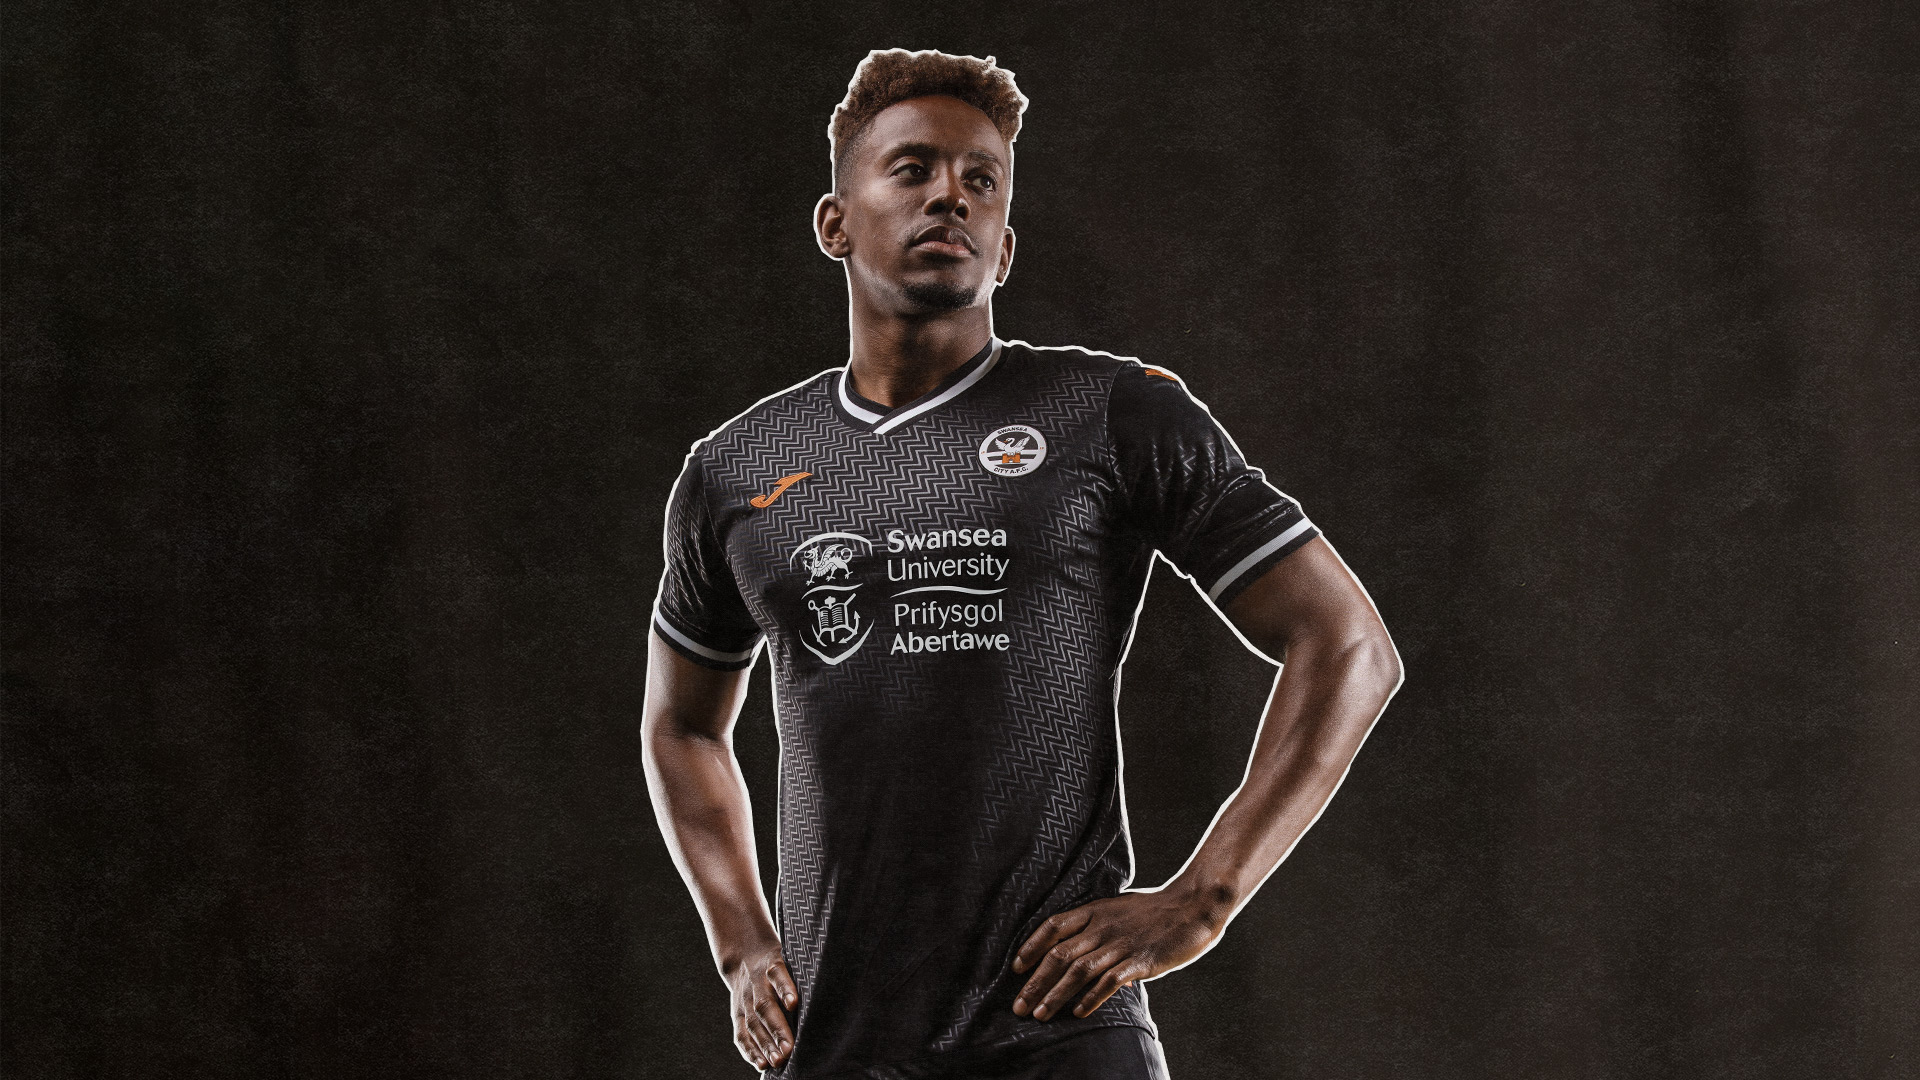 Swansea City and Joma reveal new kits for the 2021-22 season | Swansea